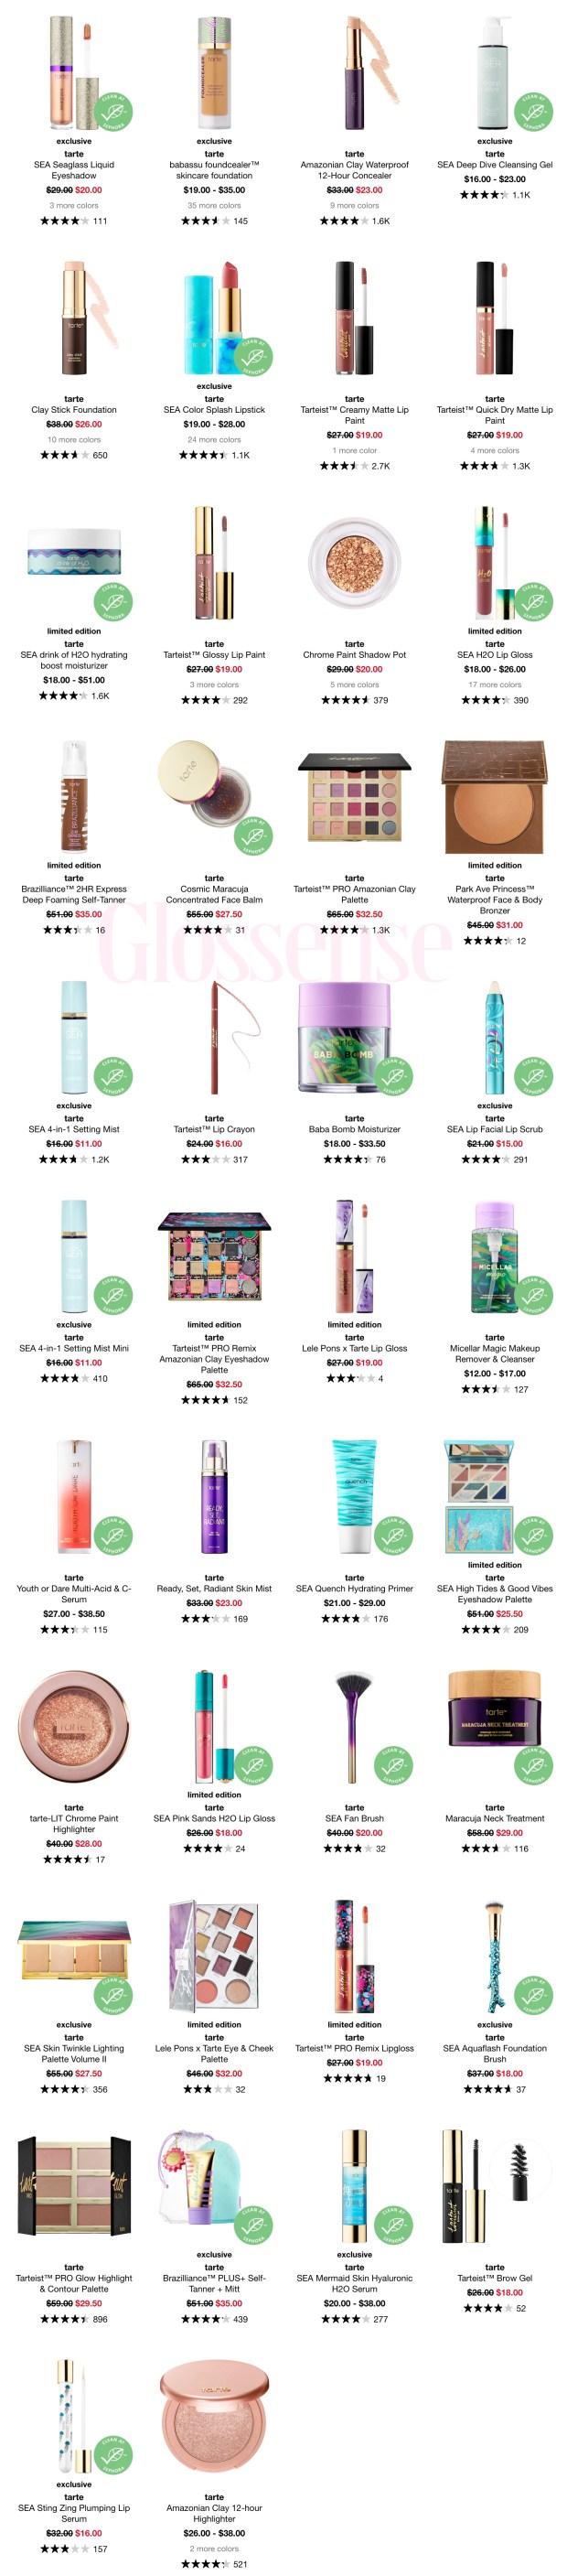 Sephora Canada Hot Sale Labour Day 2020 Save on Tarte Cosmetics Makeup Skincare Brushes - Glossense